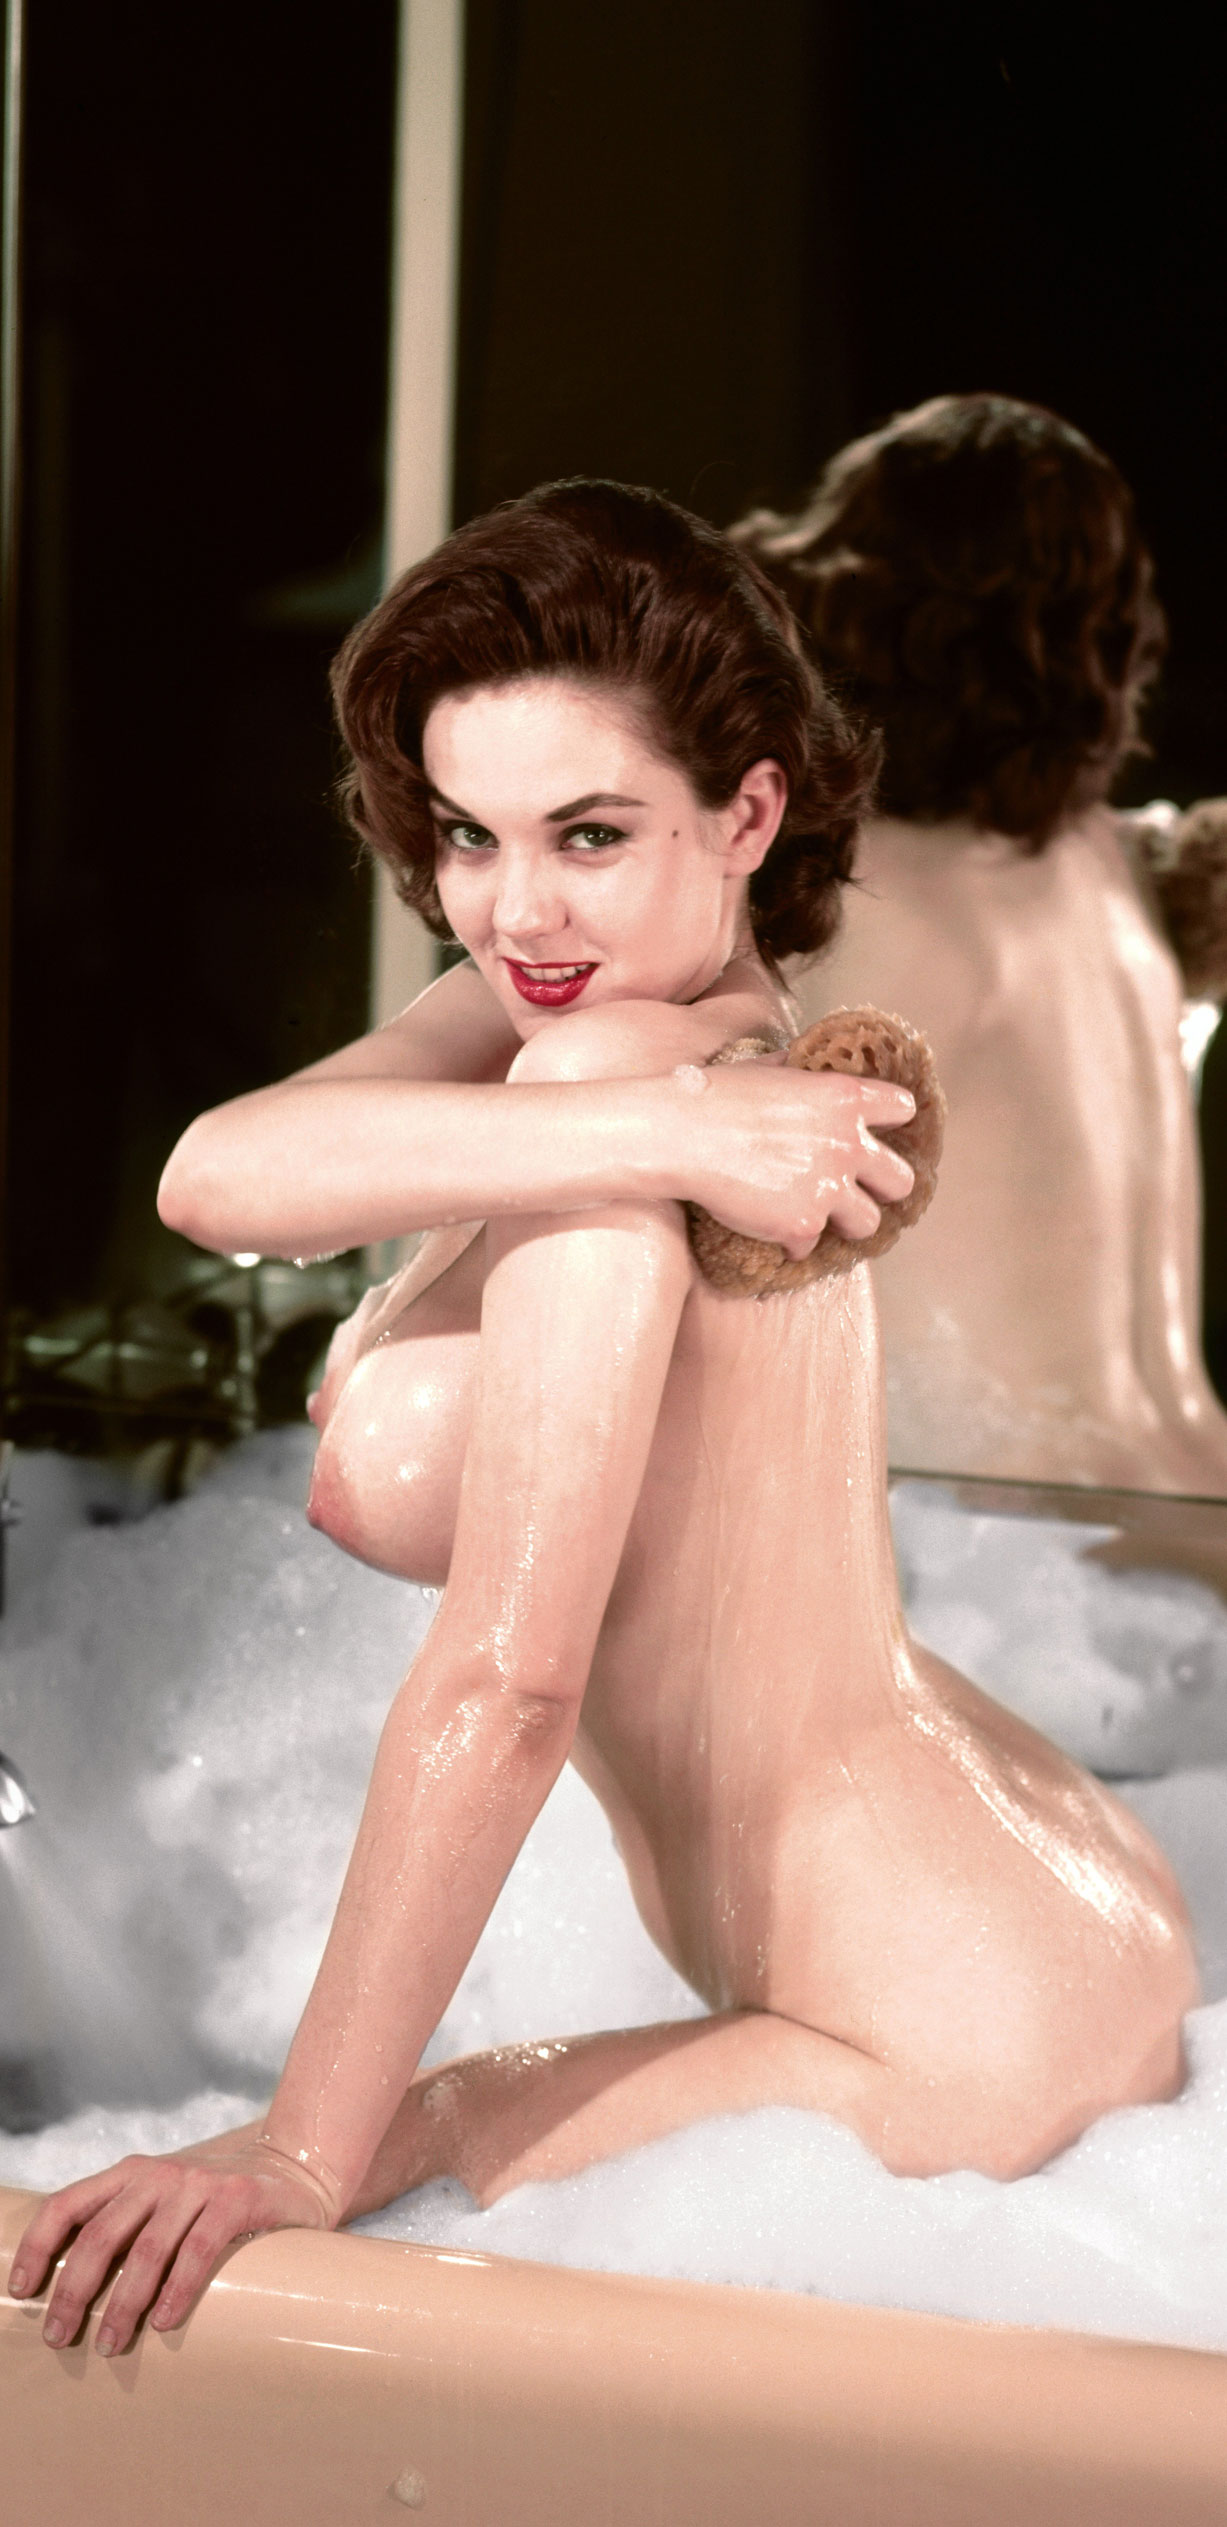 Playboy Playmate - Miss October 1957 | Colleen Farrington / Коллин Фэррингтон